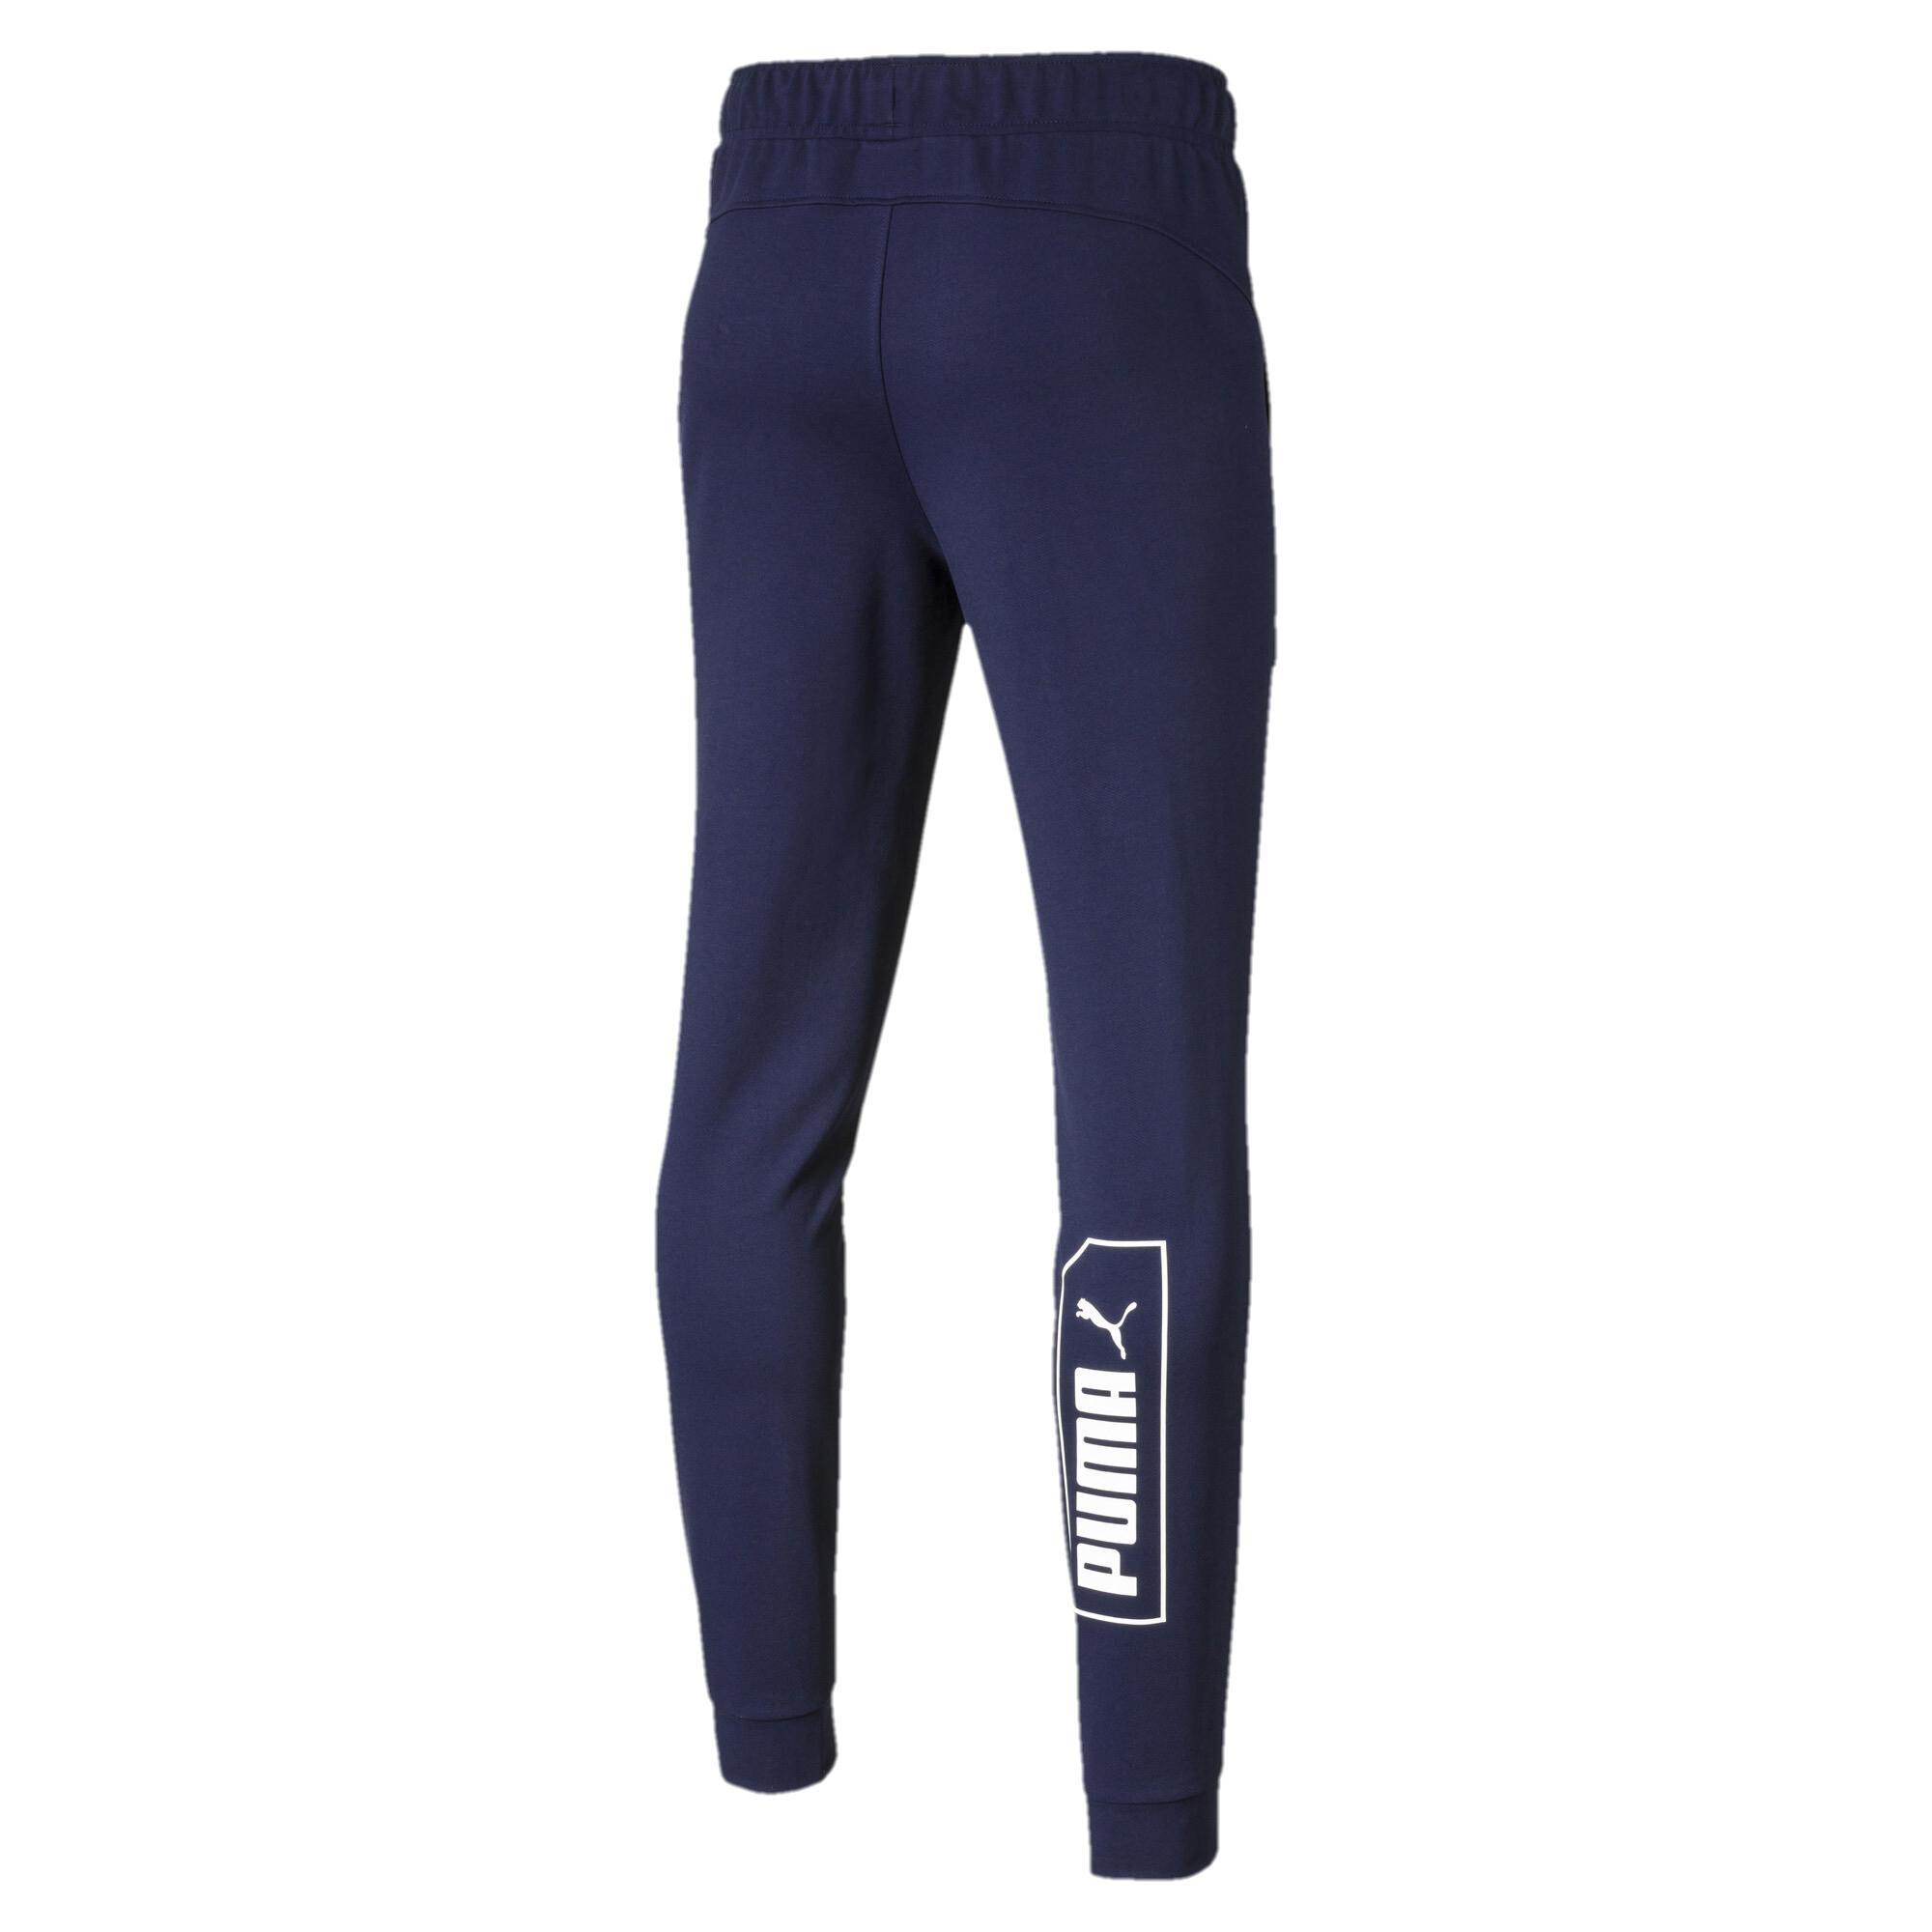 PUMA-NU-TILITY-Men-039-s-Sweatpants-Men-Knitted-Pants-Basics thumbnail 8